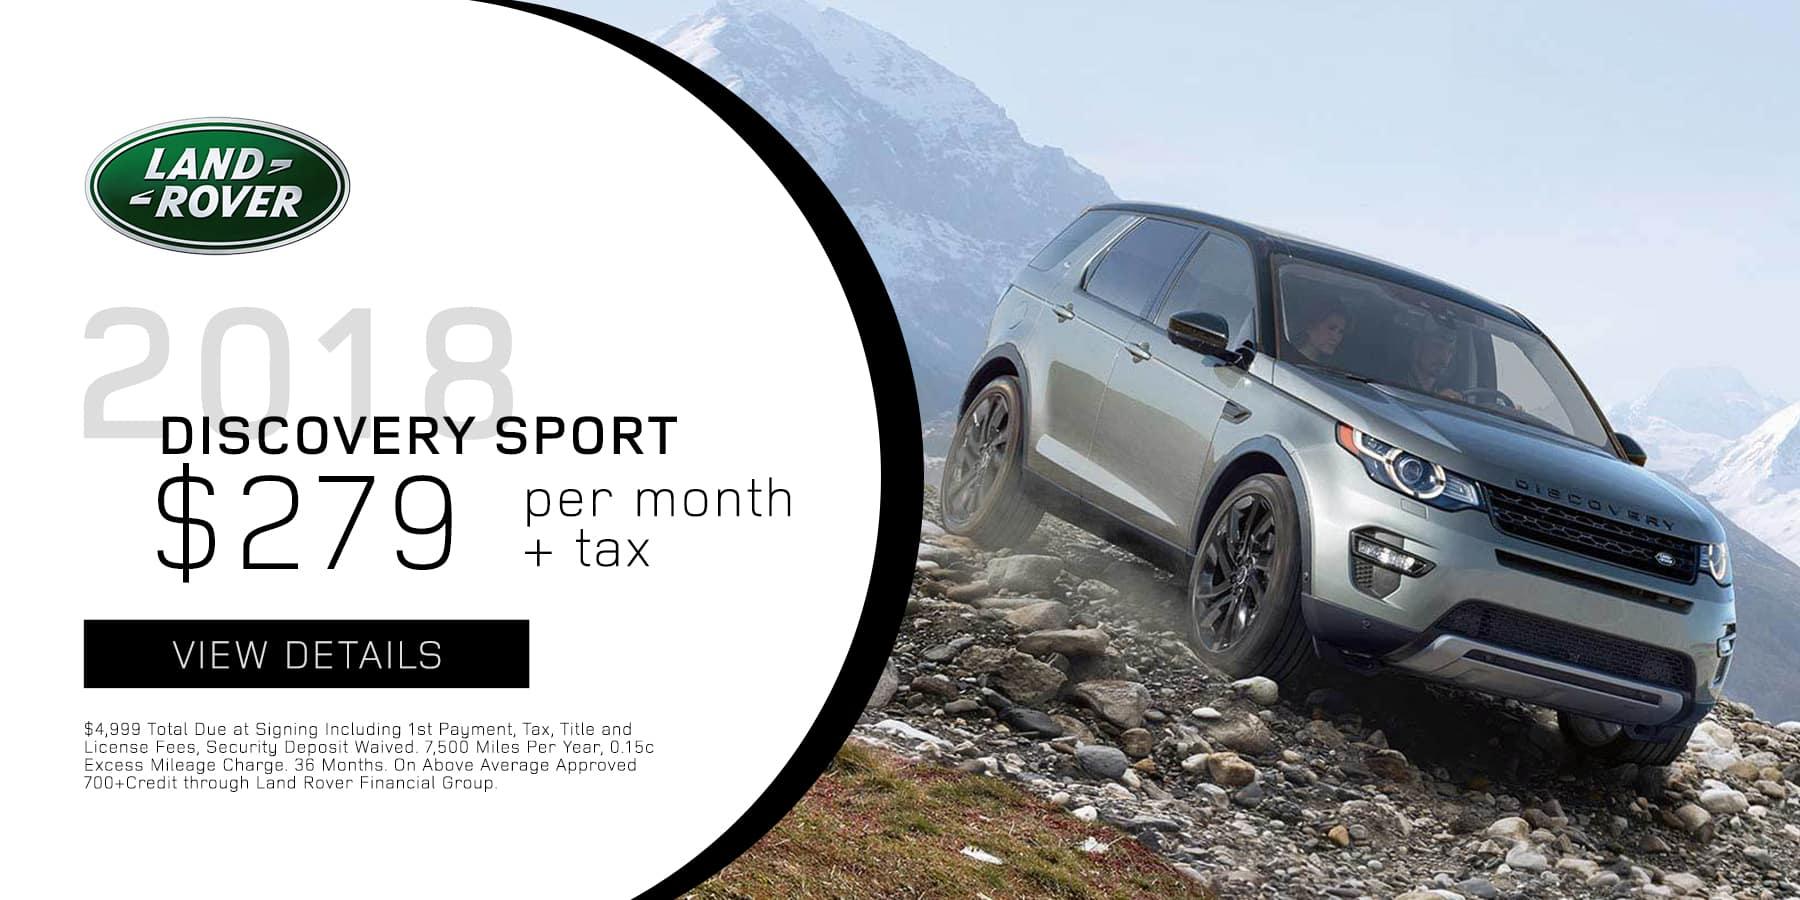 Hornburg Land Rover >> Hornburg Land Rover Dealers Santa Monica Ca New Used Land Rover